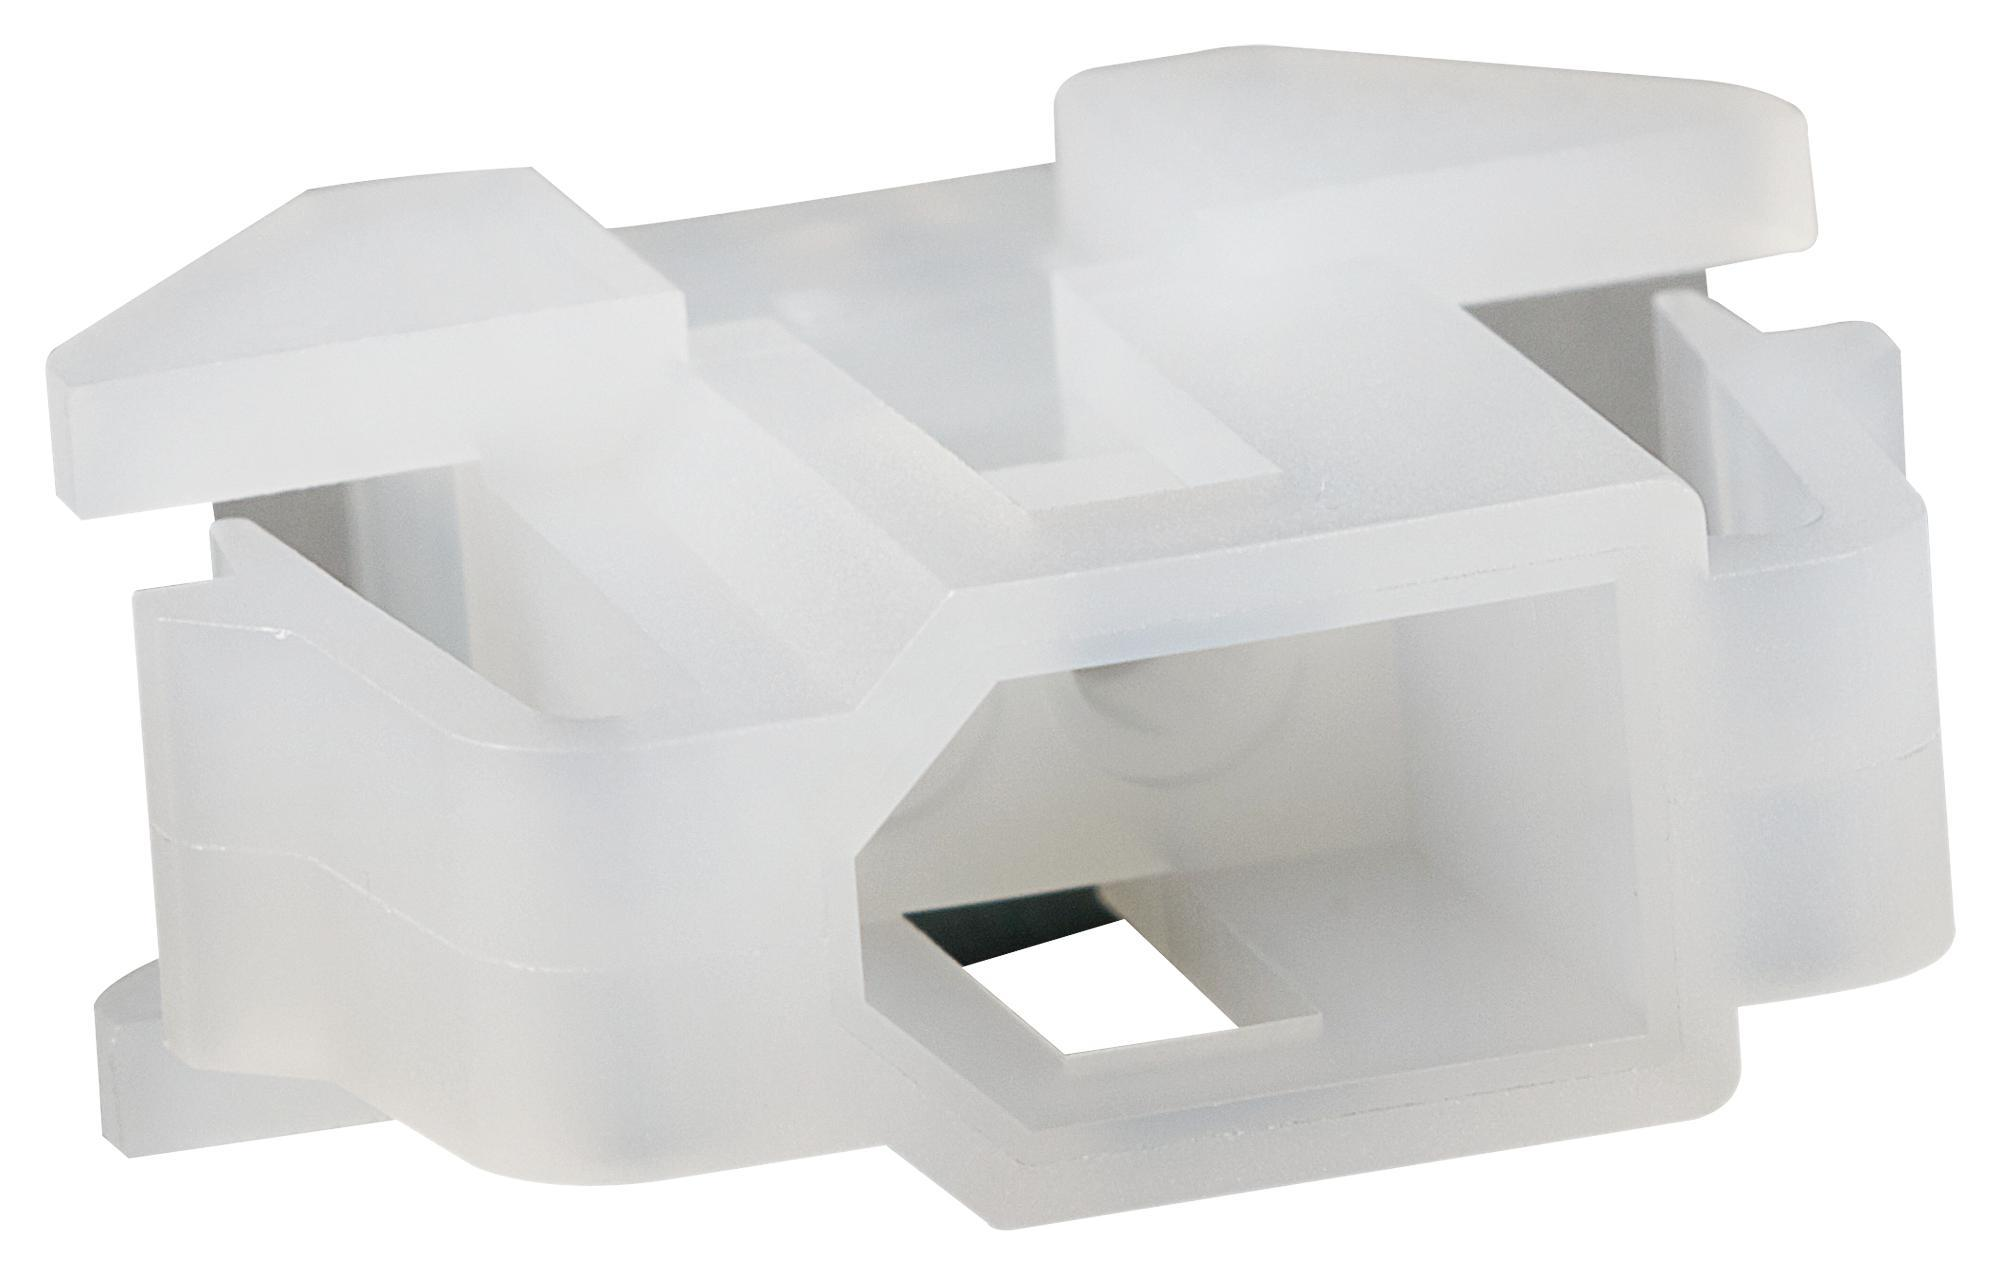 20 Positions Molex 20 Position Dual Row IDT Receptacles Strain Relief MOLEX 87569-1020-Connector Accessory